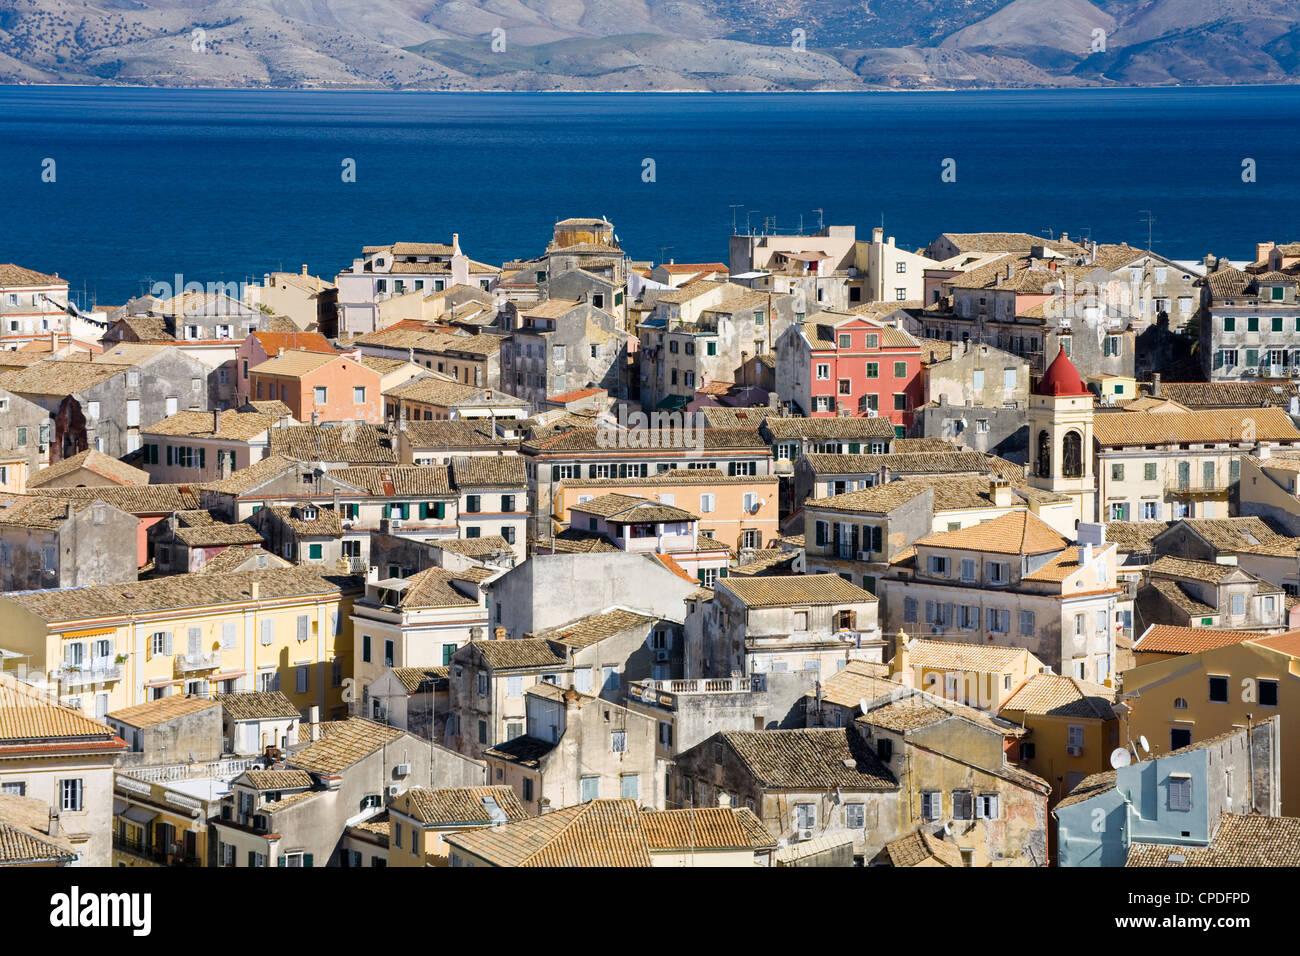 Old Town, Corfu, Ionian Islands, Greek Islands, Greece, Europe - Stock Image